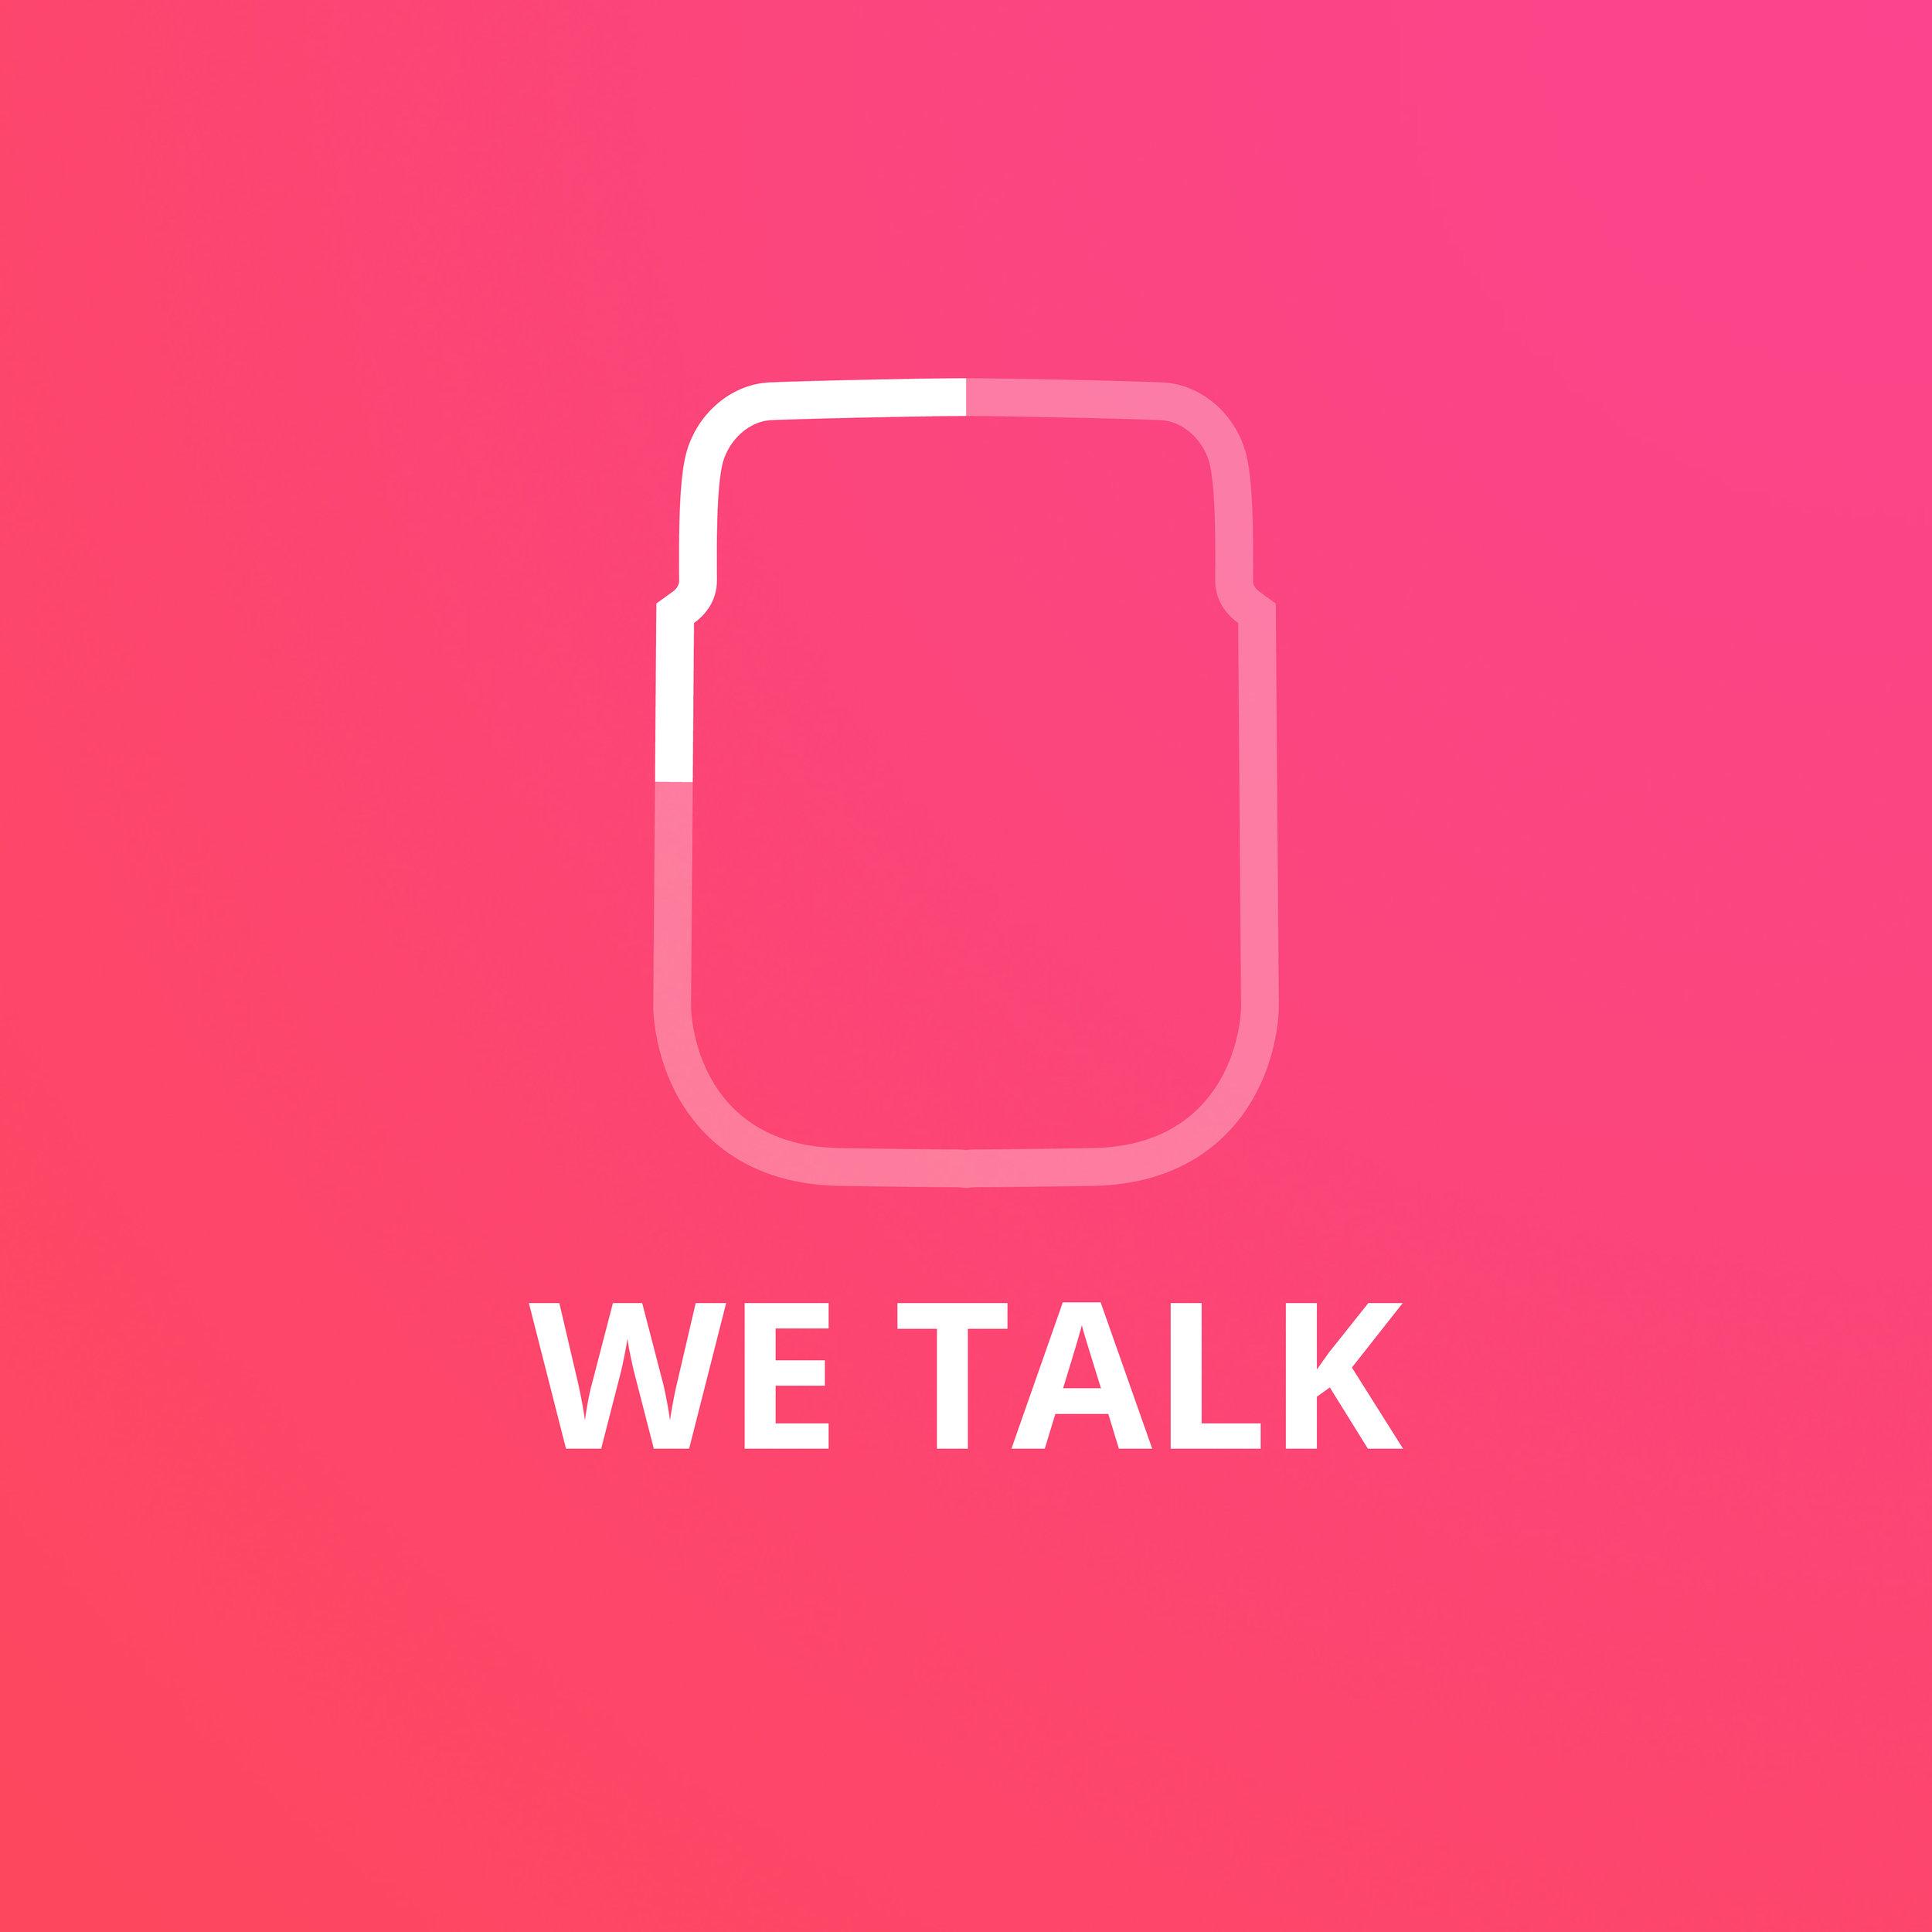 We Talk-01.jpg